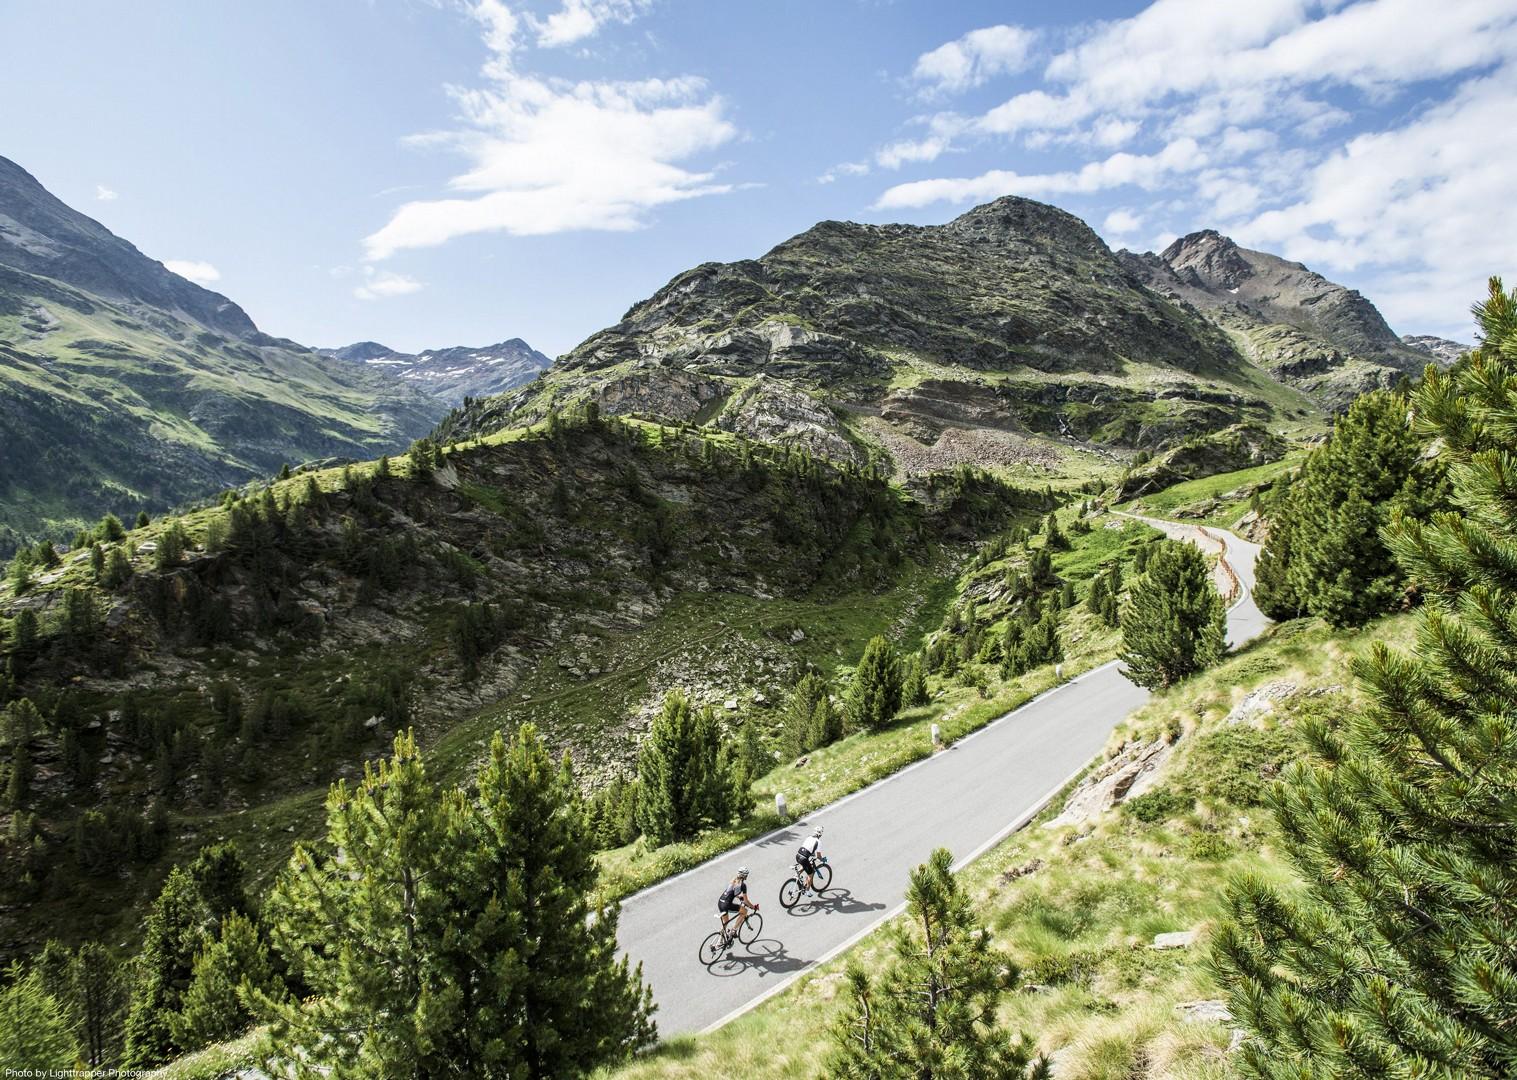 citta-alta-guided-road-cycling-holiday.jpg - Italy - Italian Alps Introduction - Guided Road Cycling Holiday - Road Cycling